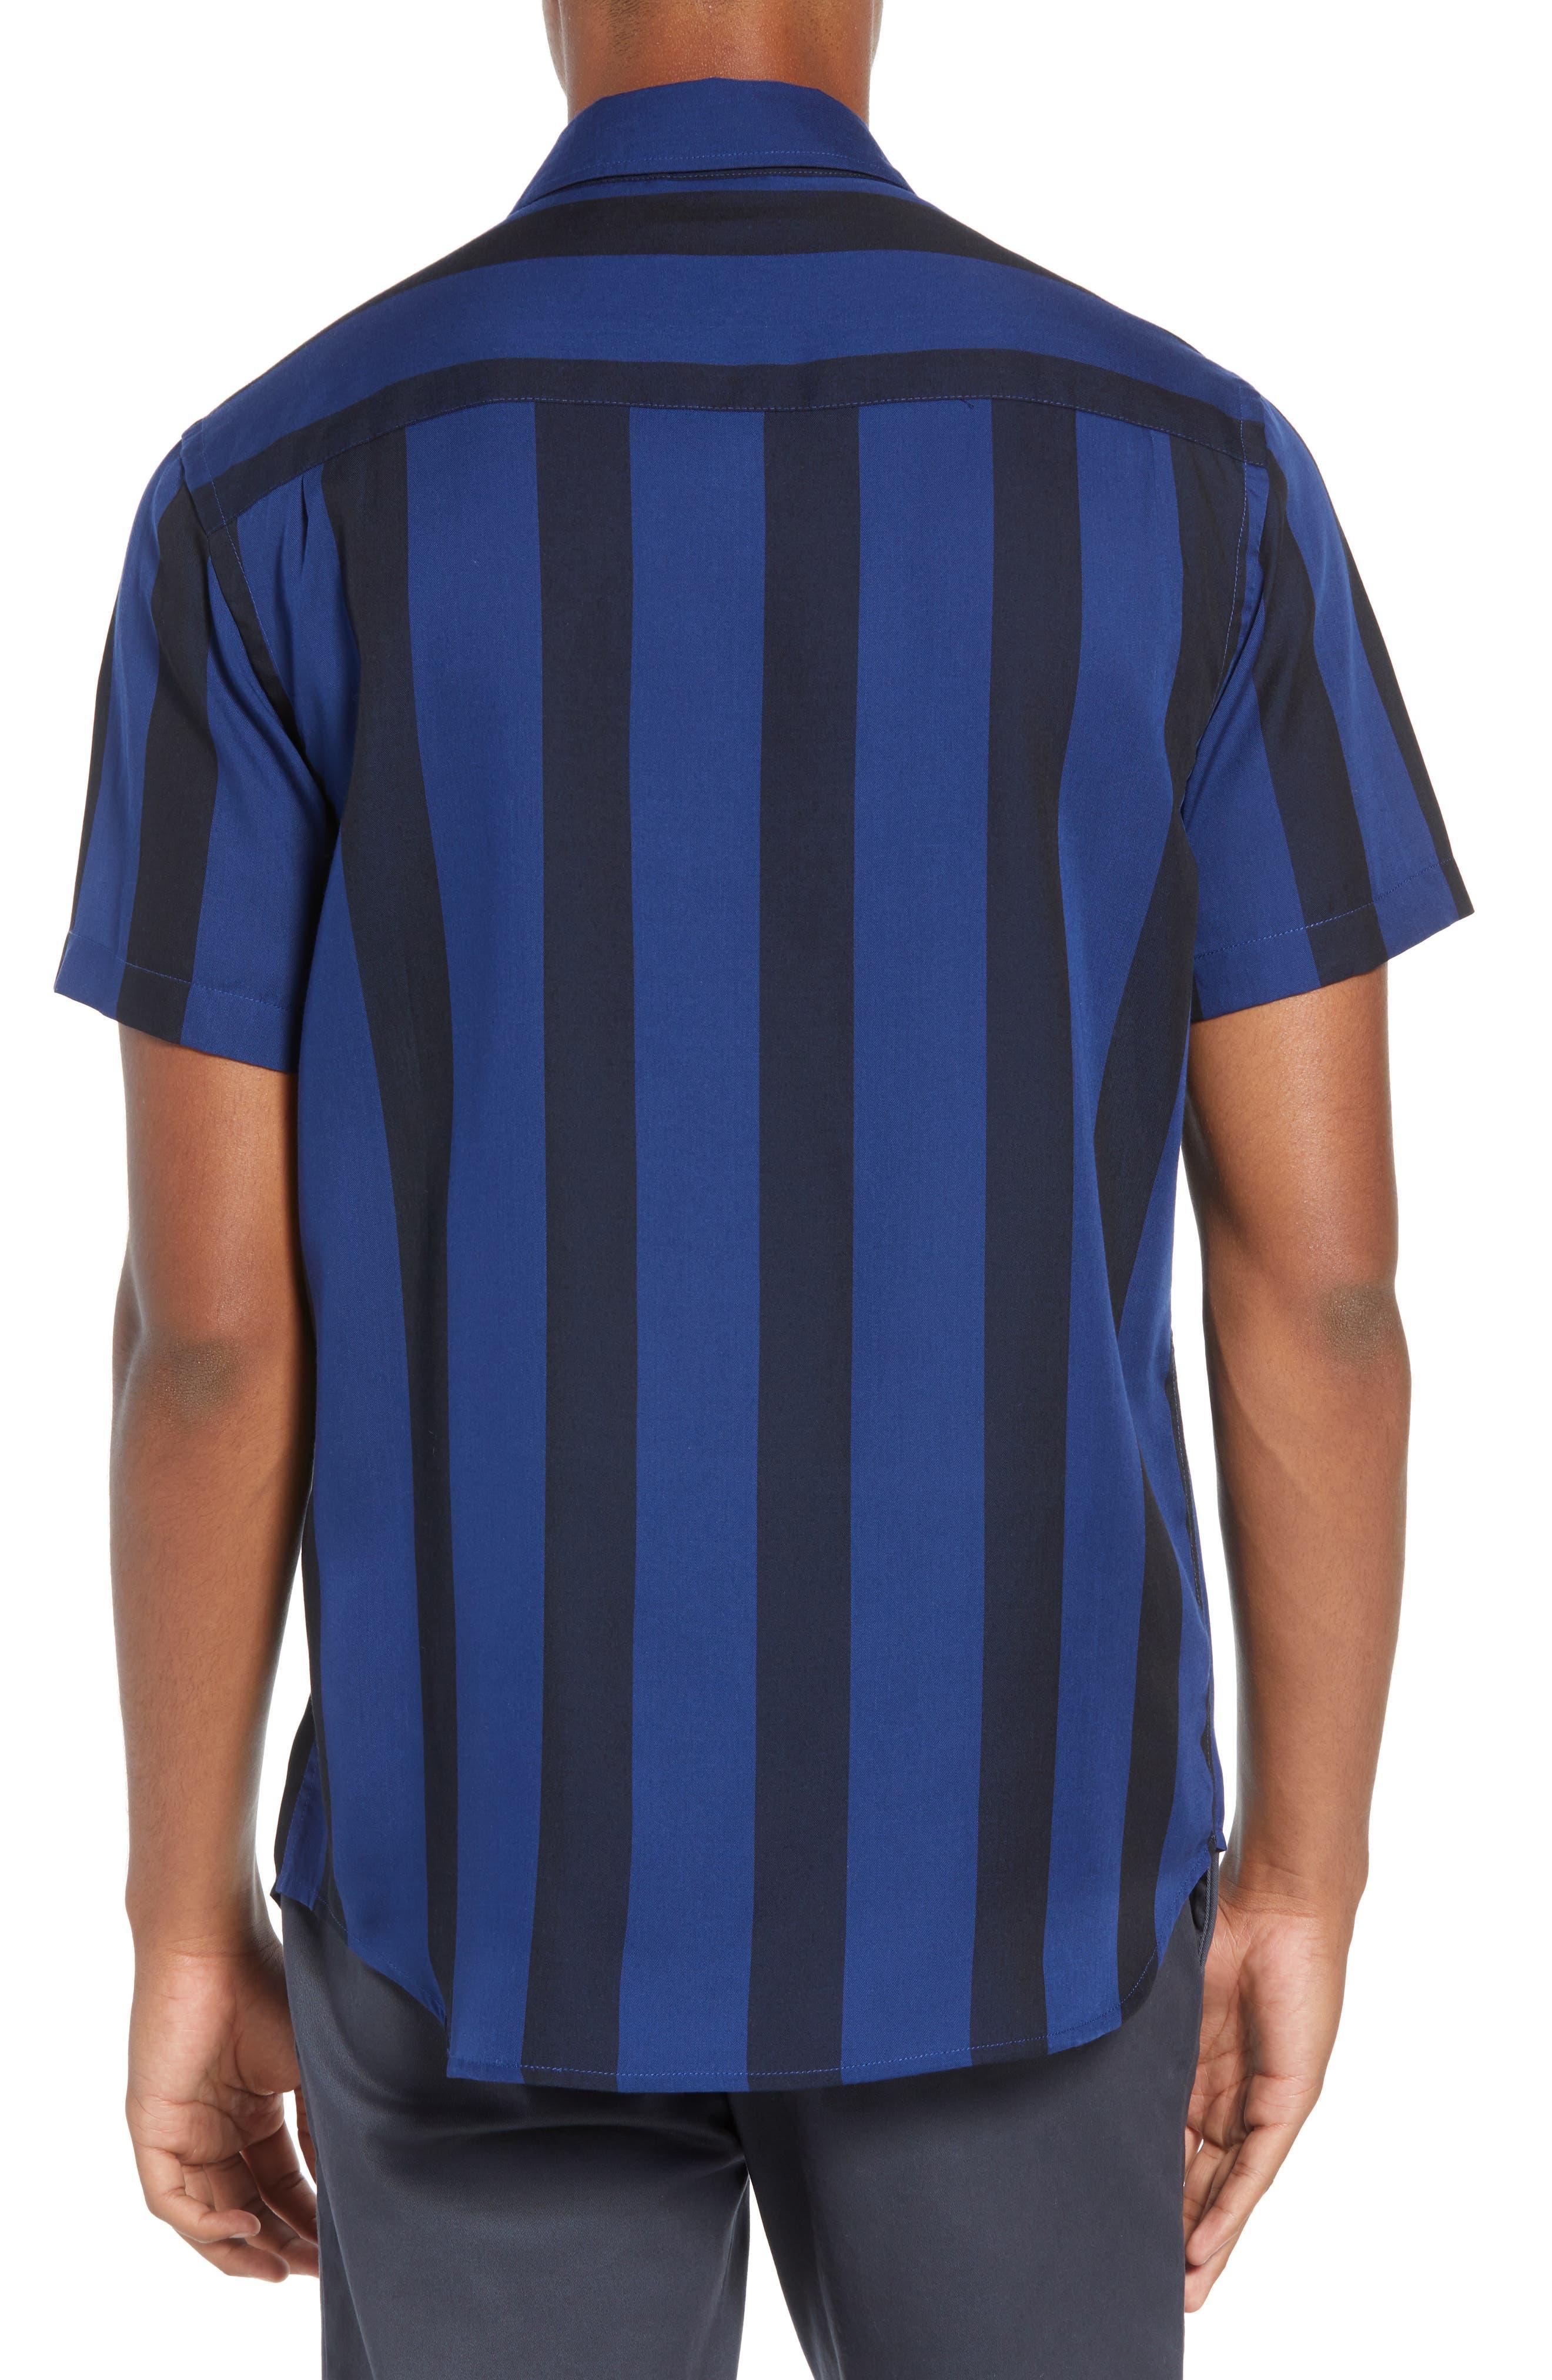 SATURDAYS NYC,                             Saturdays Nico Broad Stripe Woven Shirt,                             Alternate thumbnail 3, color,                             001